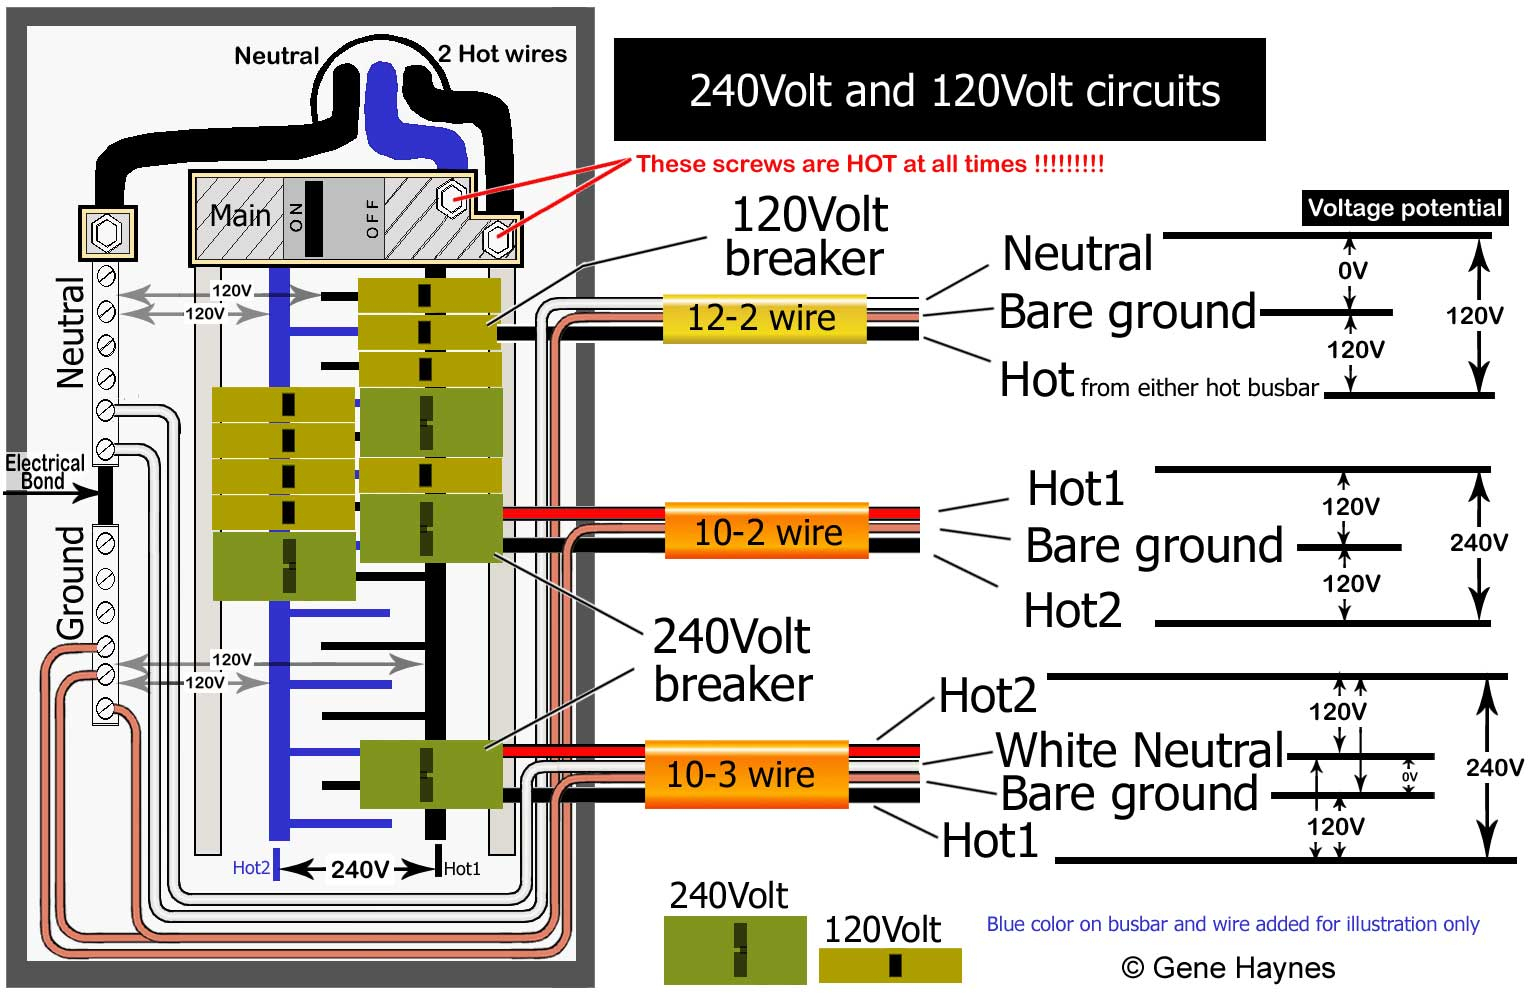 Wiring 240 Vac | Wiring Diagram - 240 Volt Single Phase Wiring Diagram